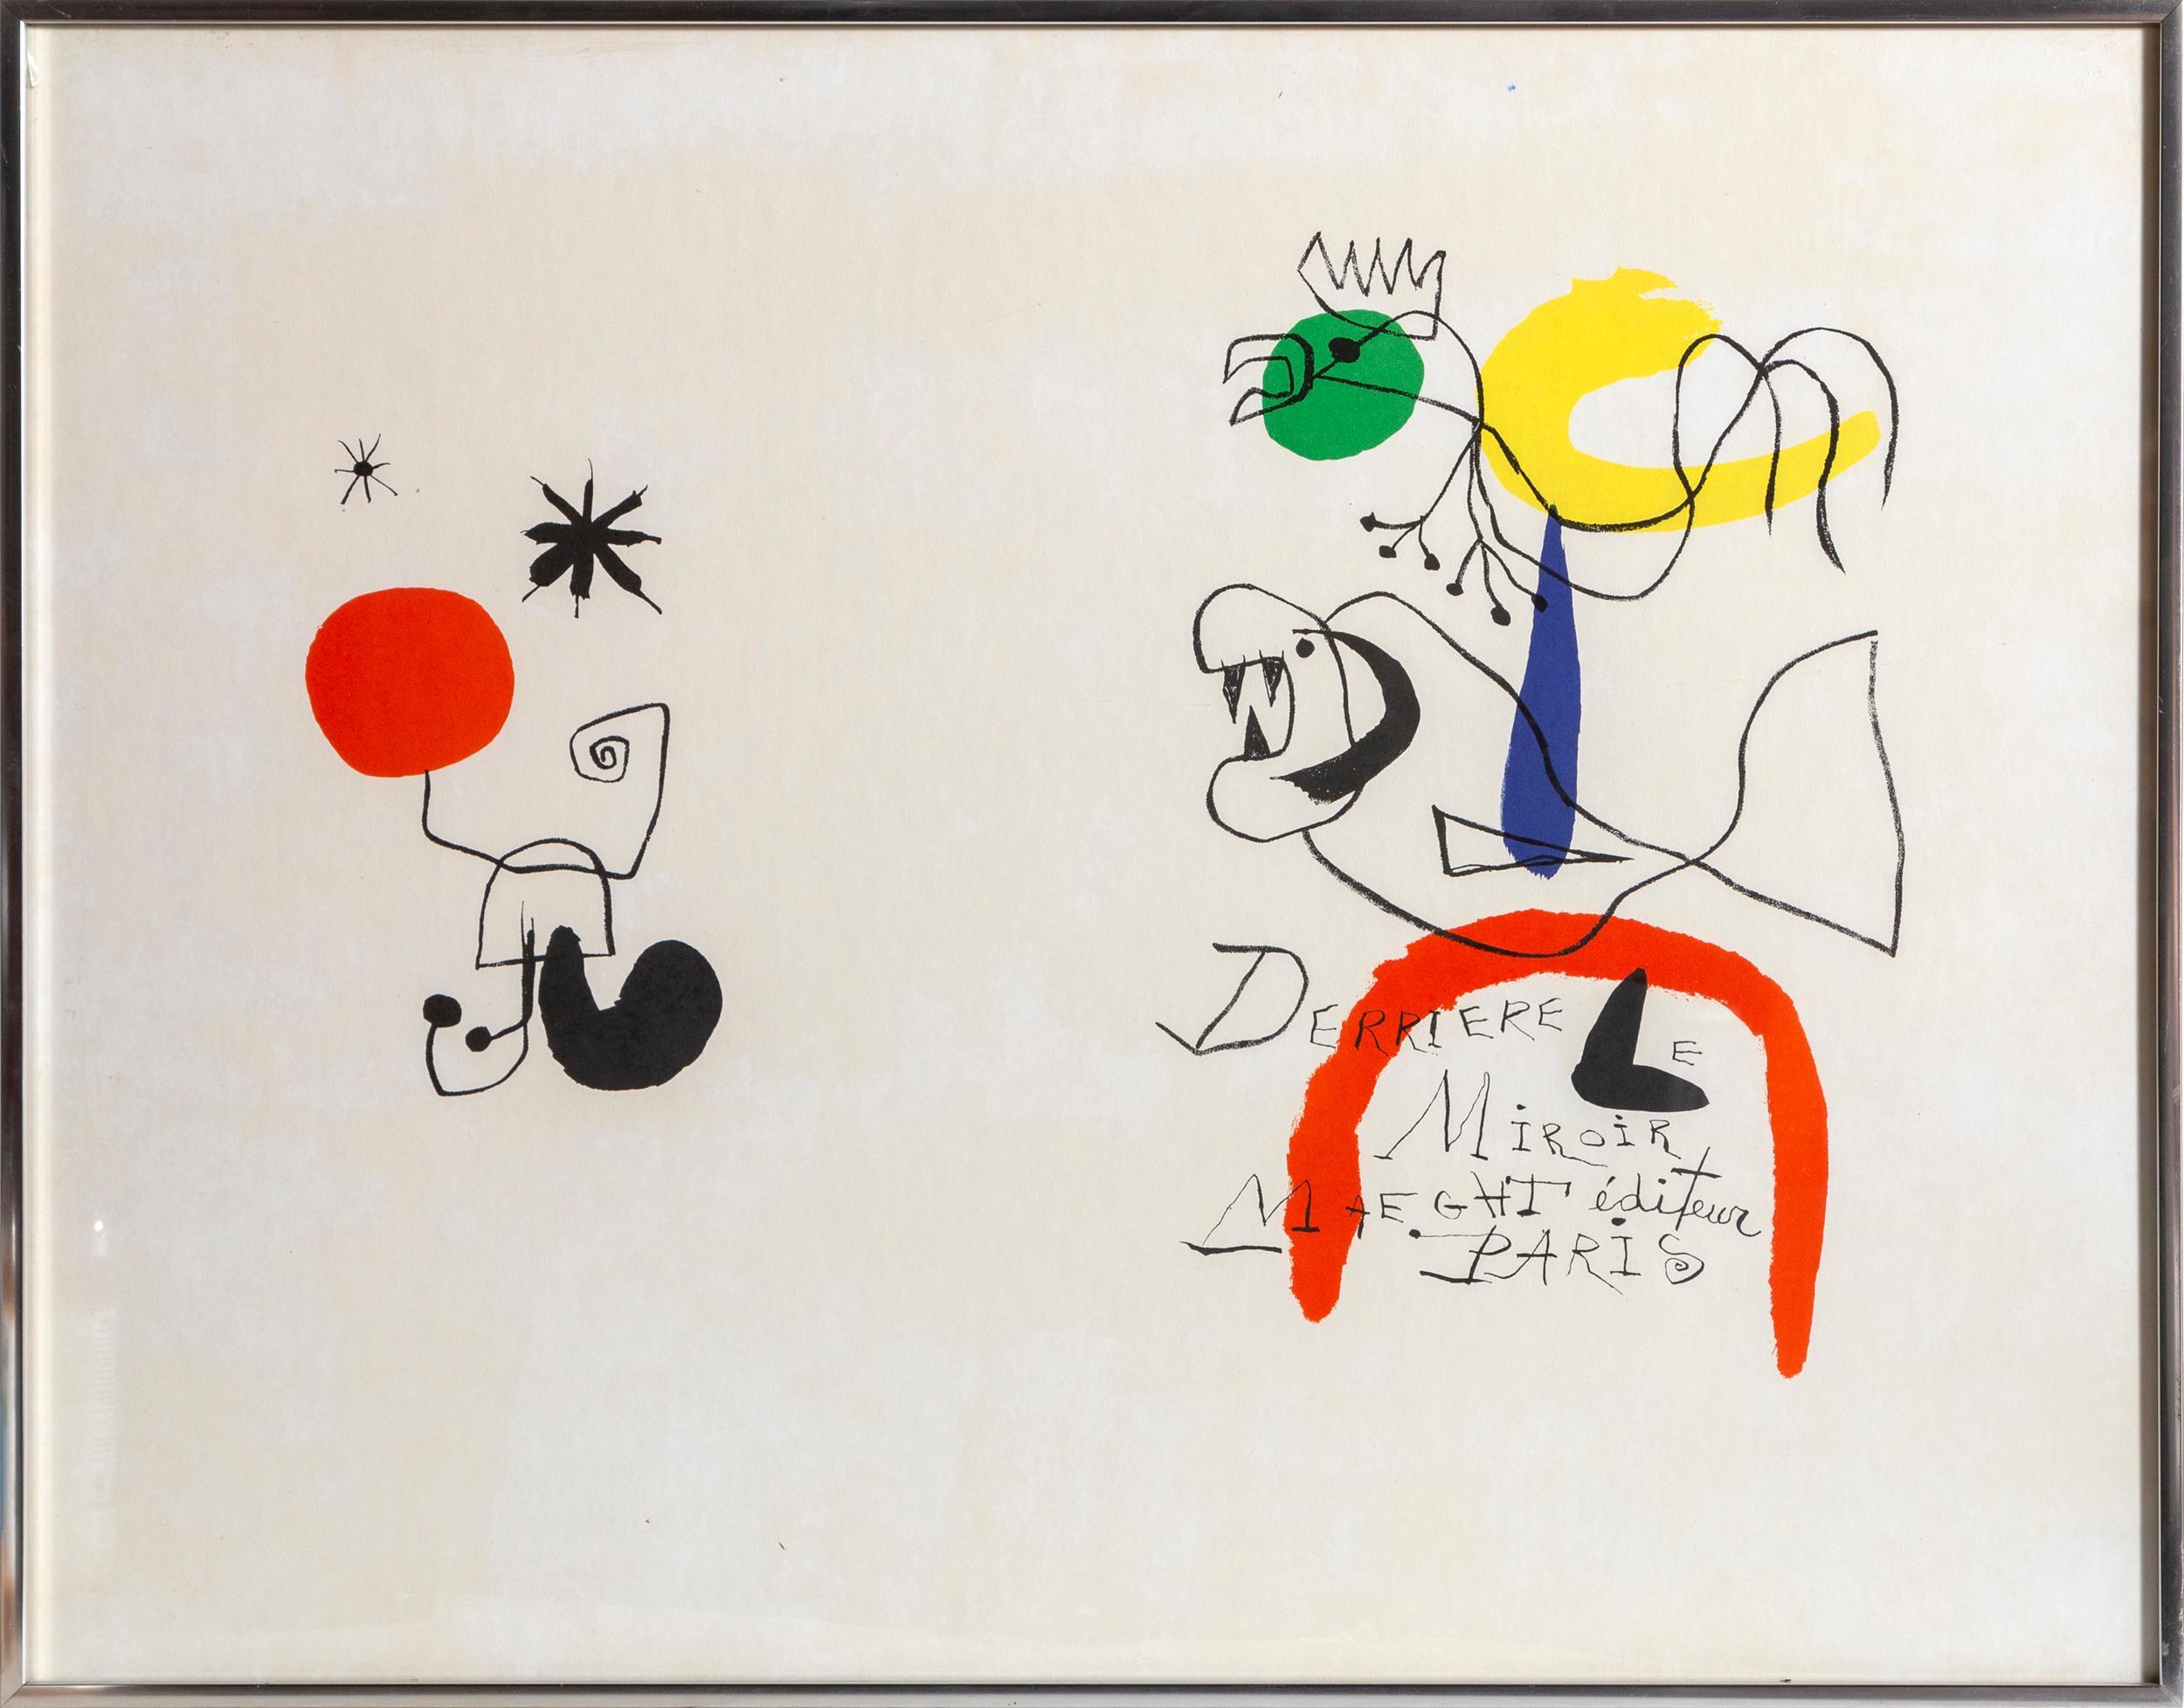 Joan Miro, Derrier le Miroir, Lithograph